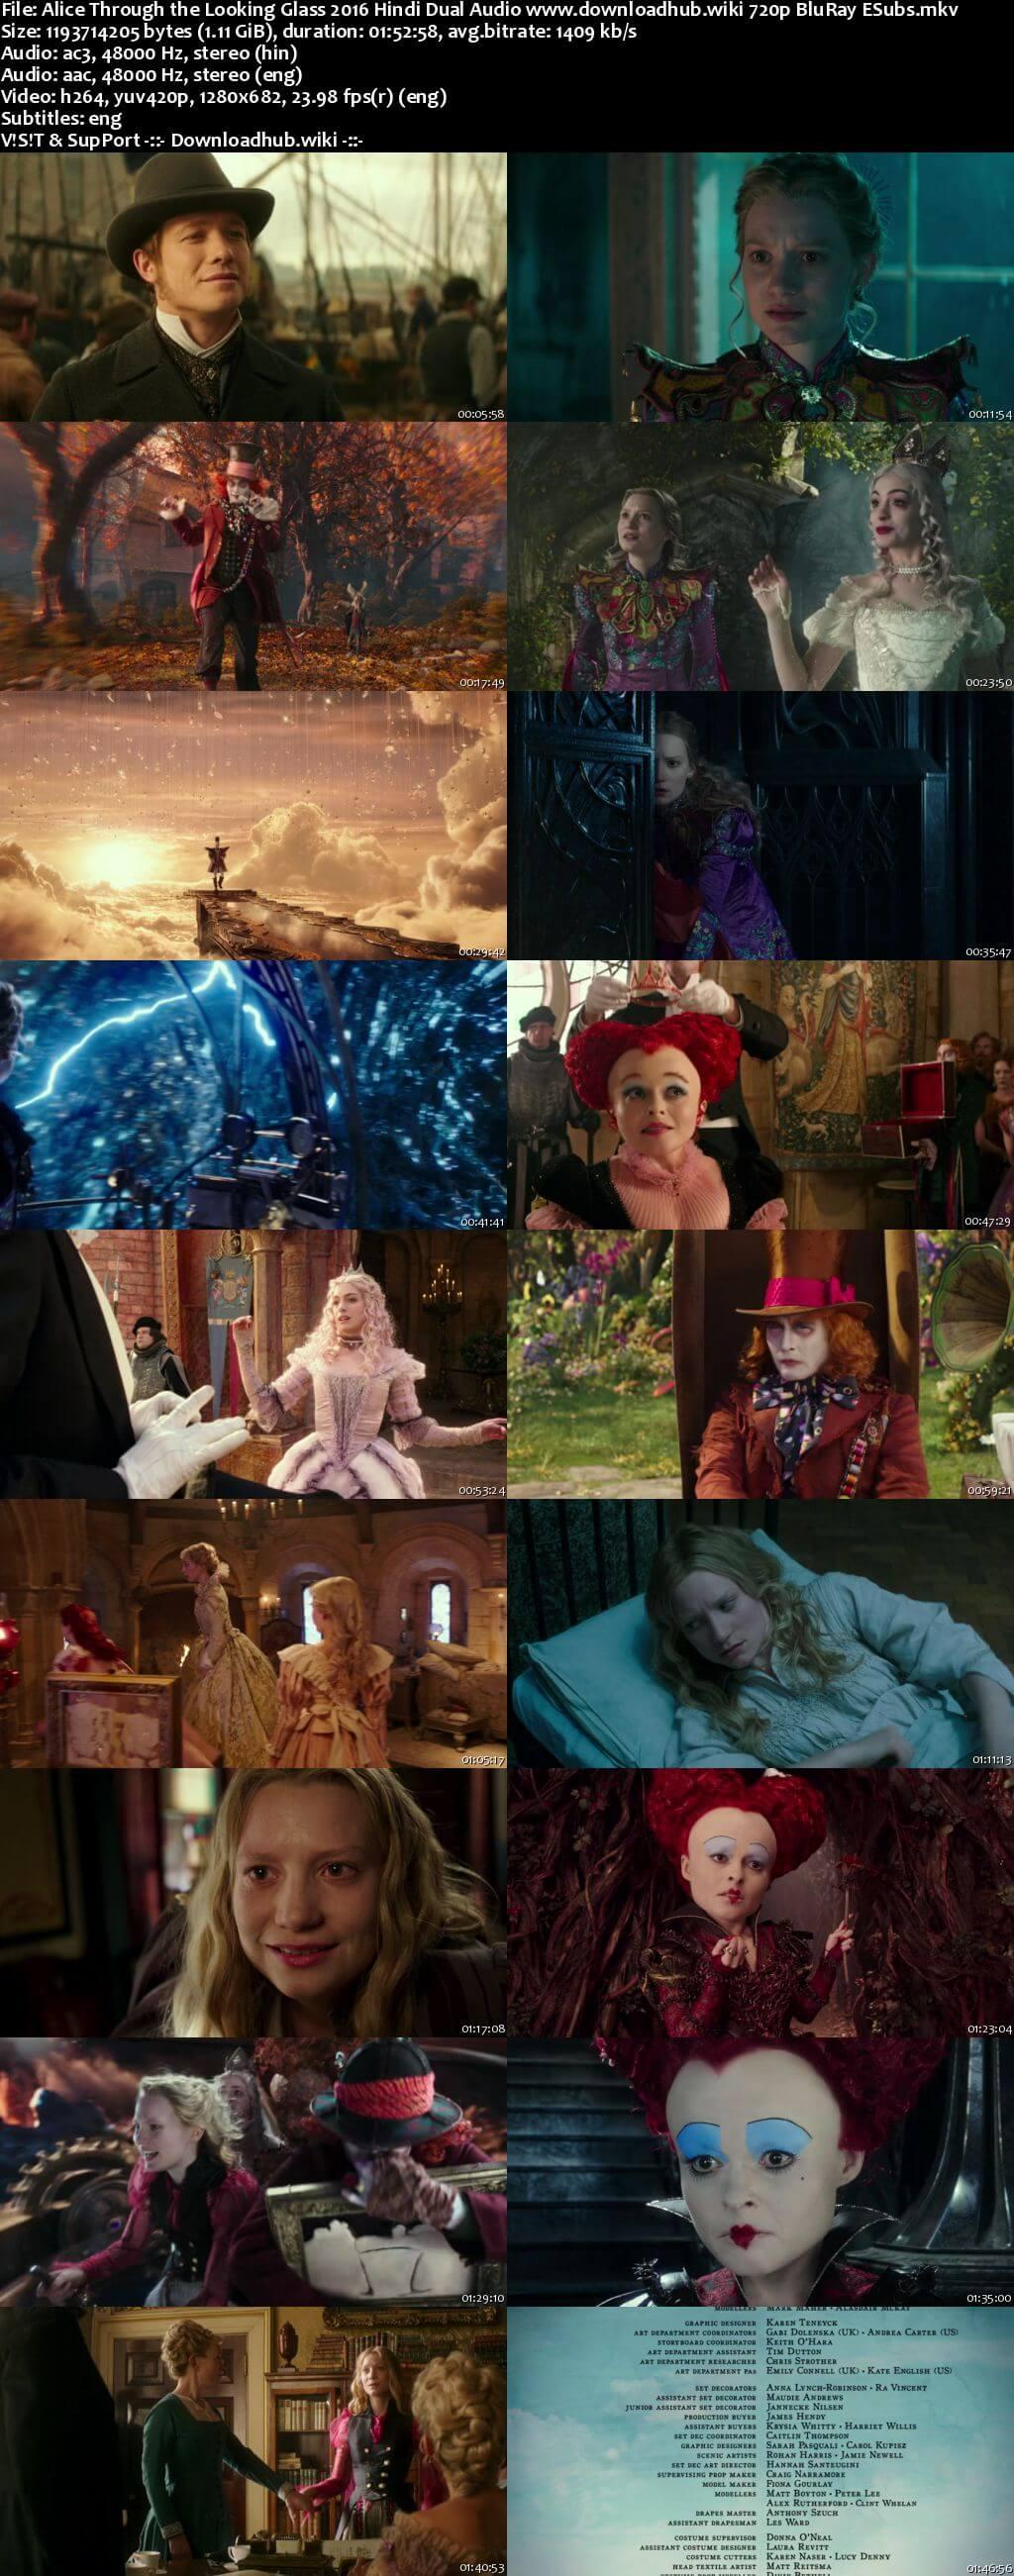 Alice Through the Looking Glass 2016 Hindi Dual Audio 720p BluRay ESubs